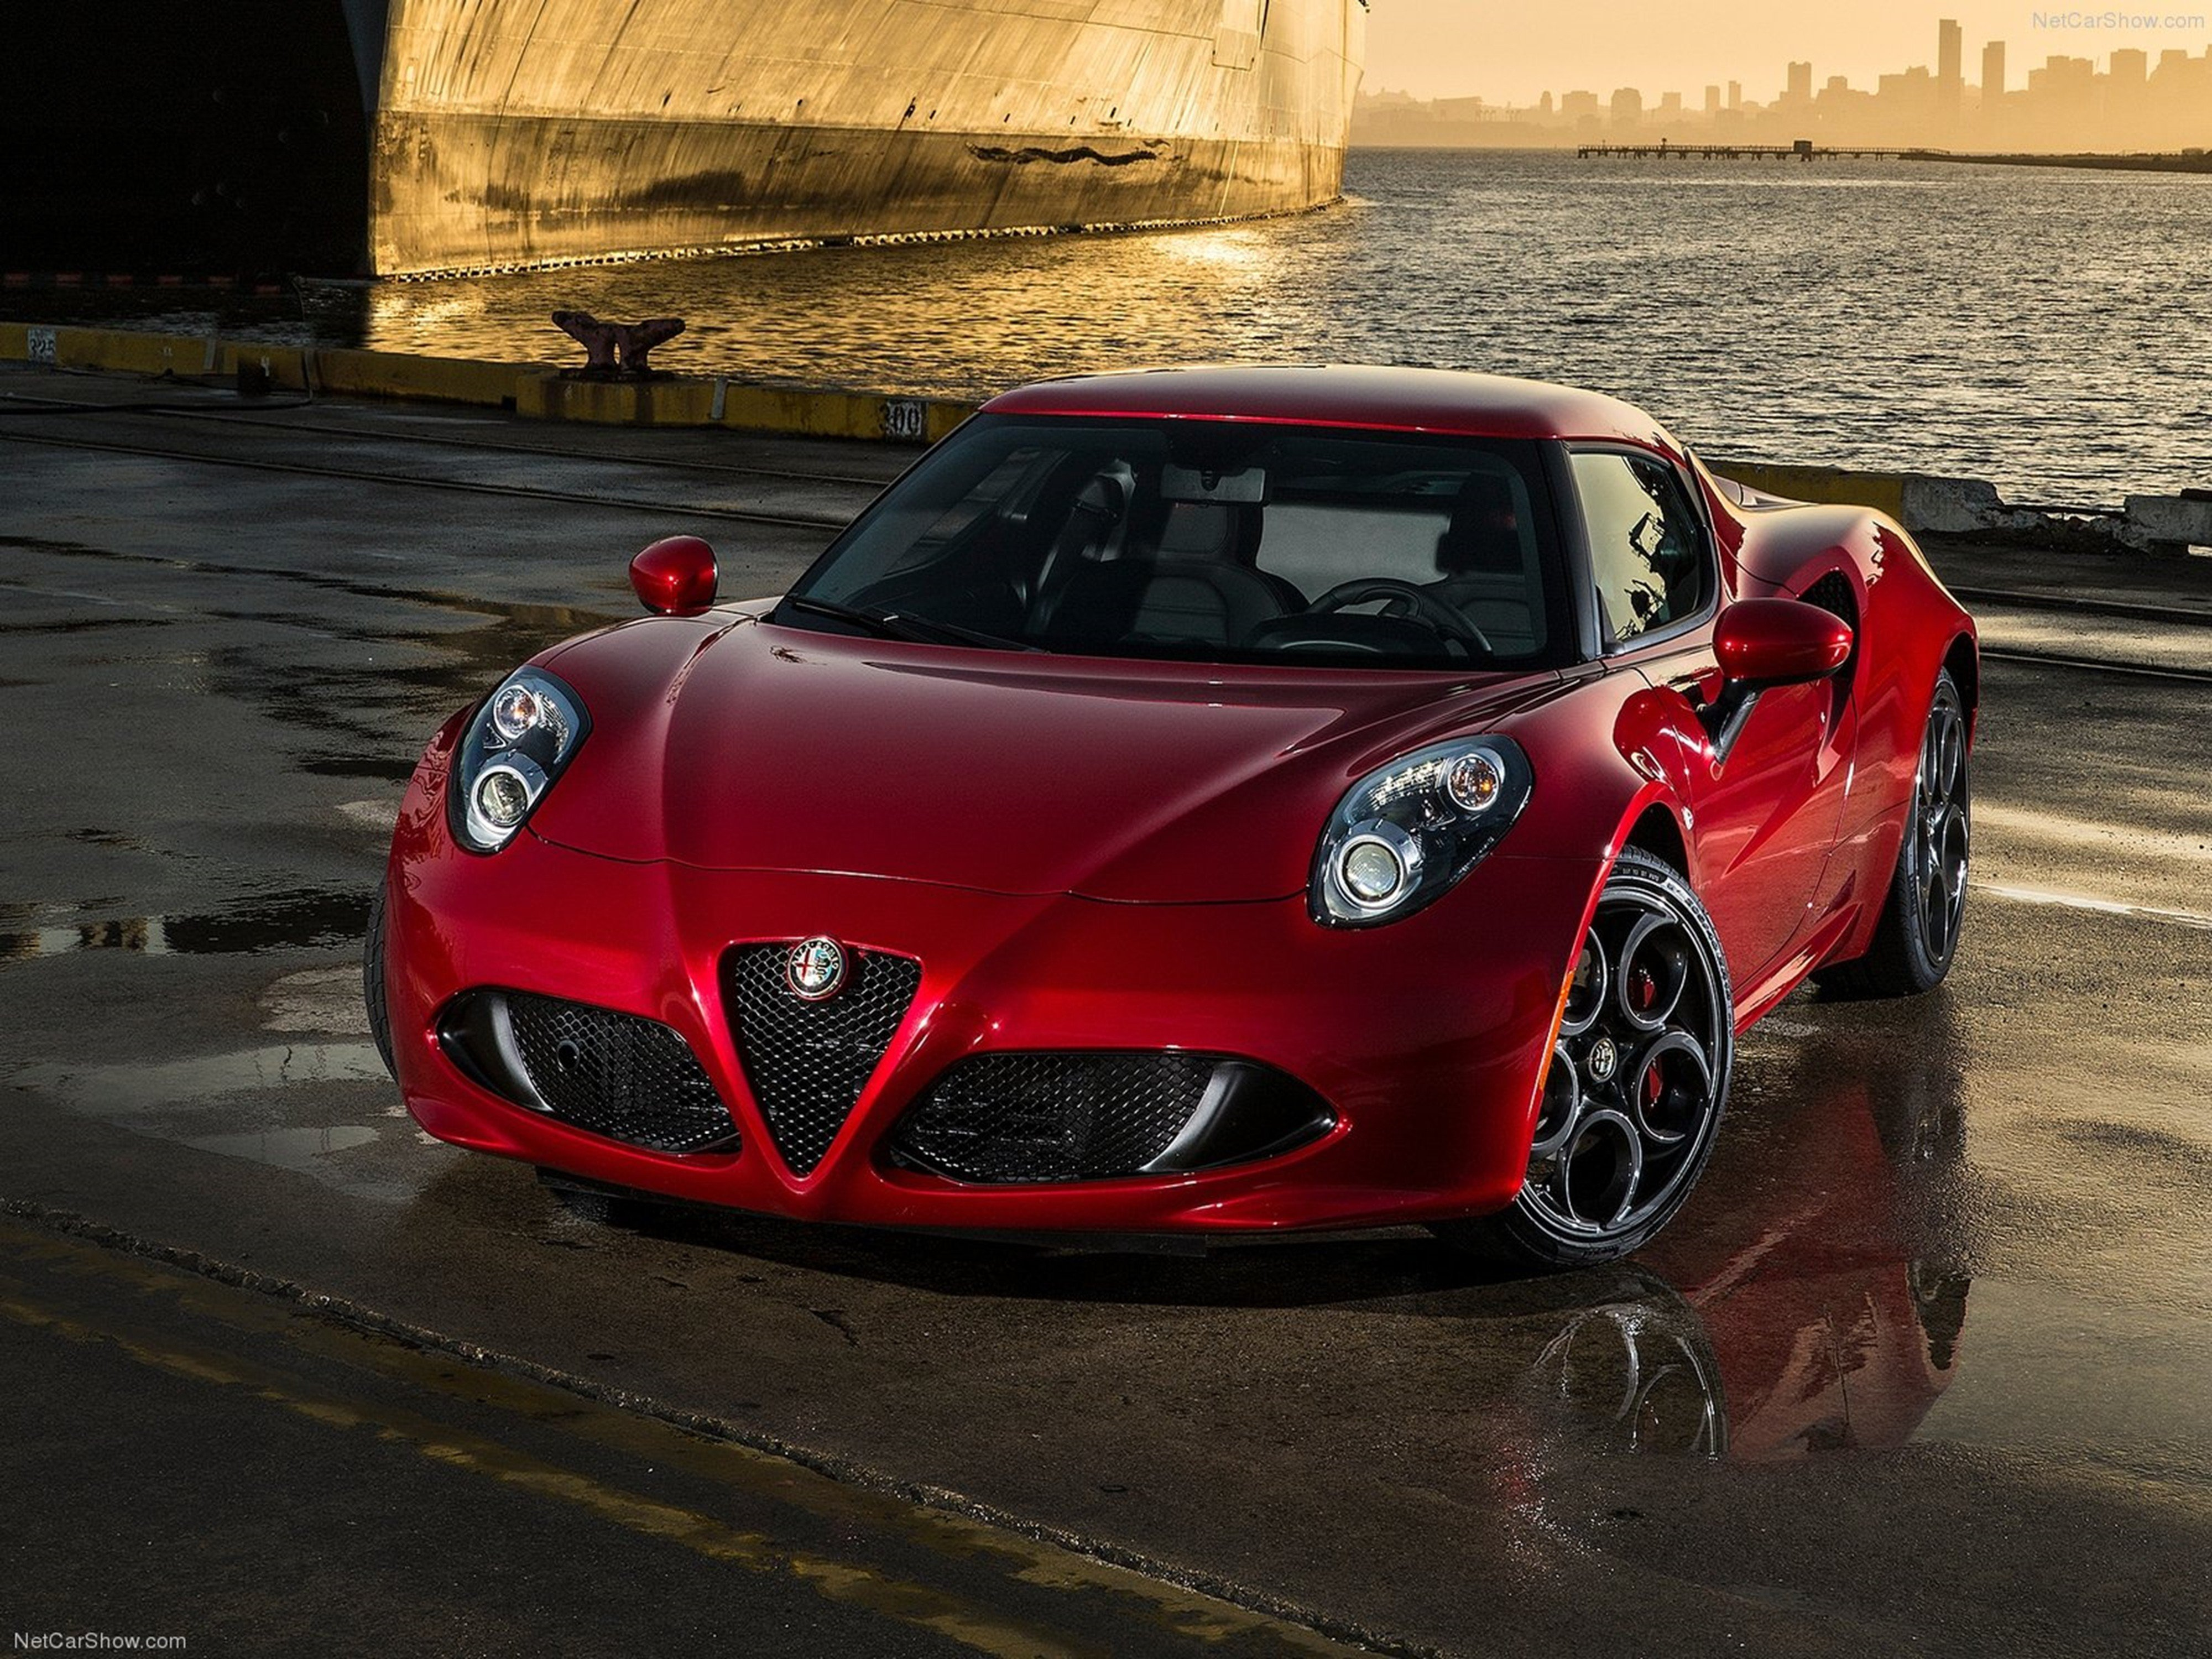 Alfa Romeo 4c Wallpapers High Resolution 4000x3000 Wallpaper Teahub Io